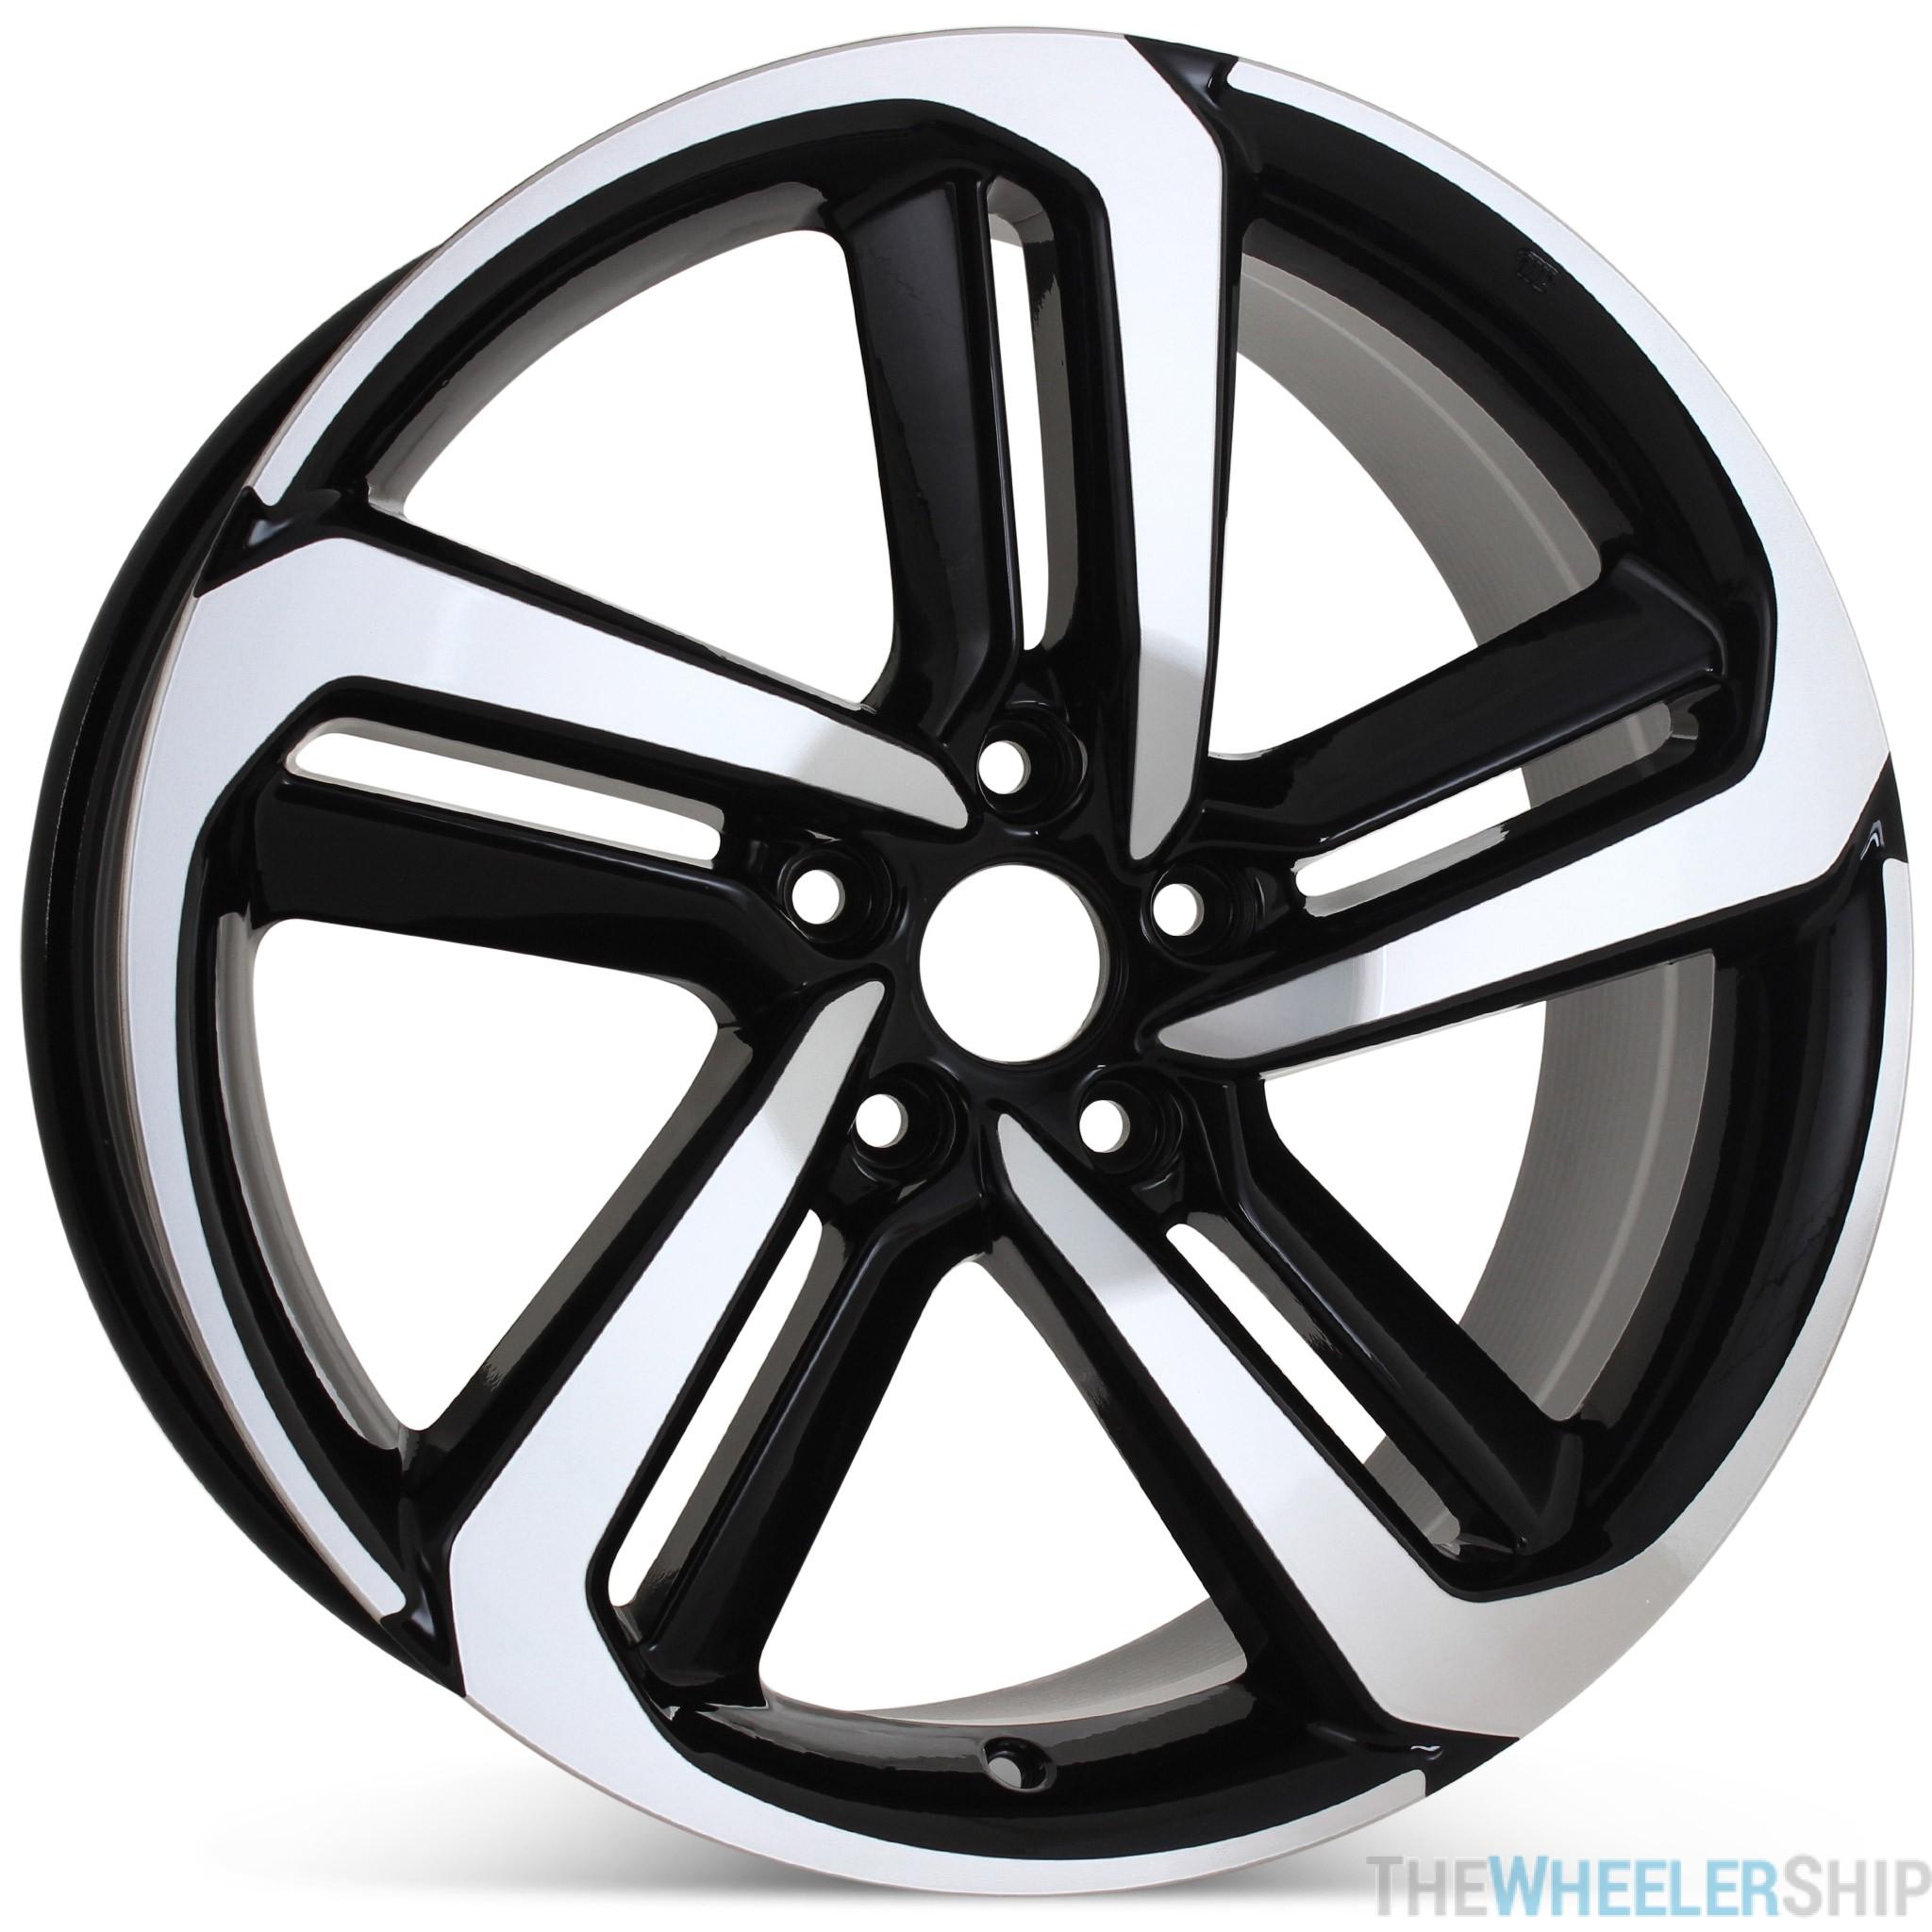 Honda Factory Rims >> New 19 X 8 5 Replacement Wheel For Honda Accord Sport 2018 2019 Rim 64127